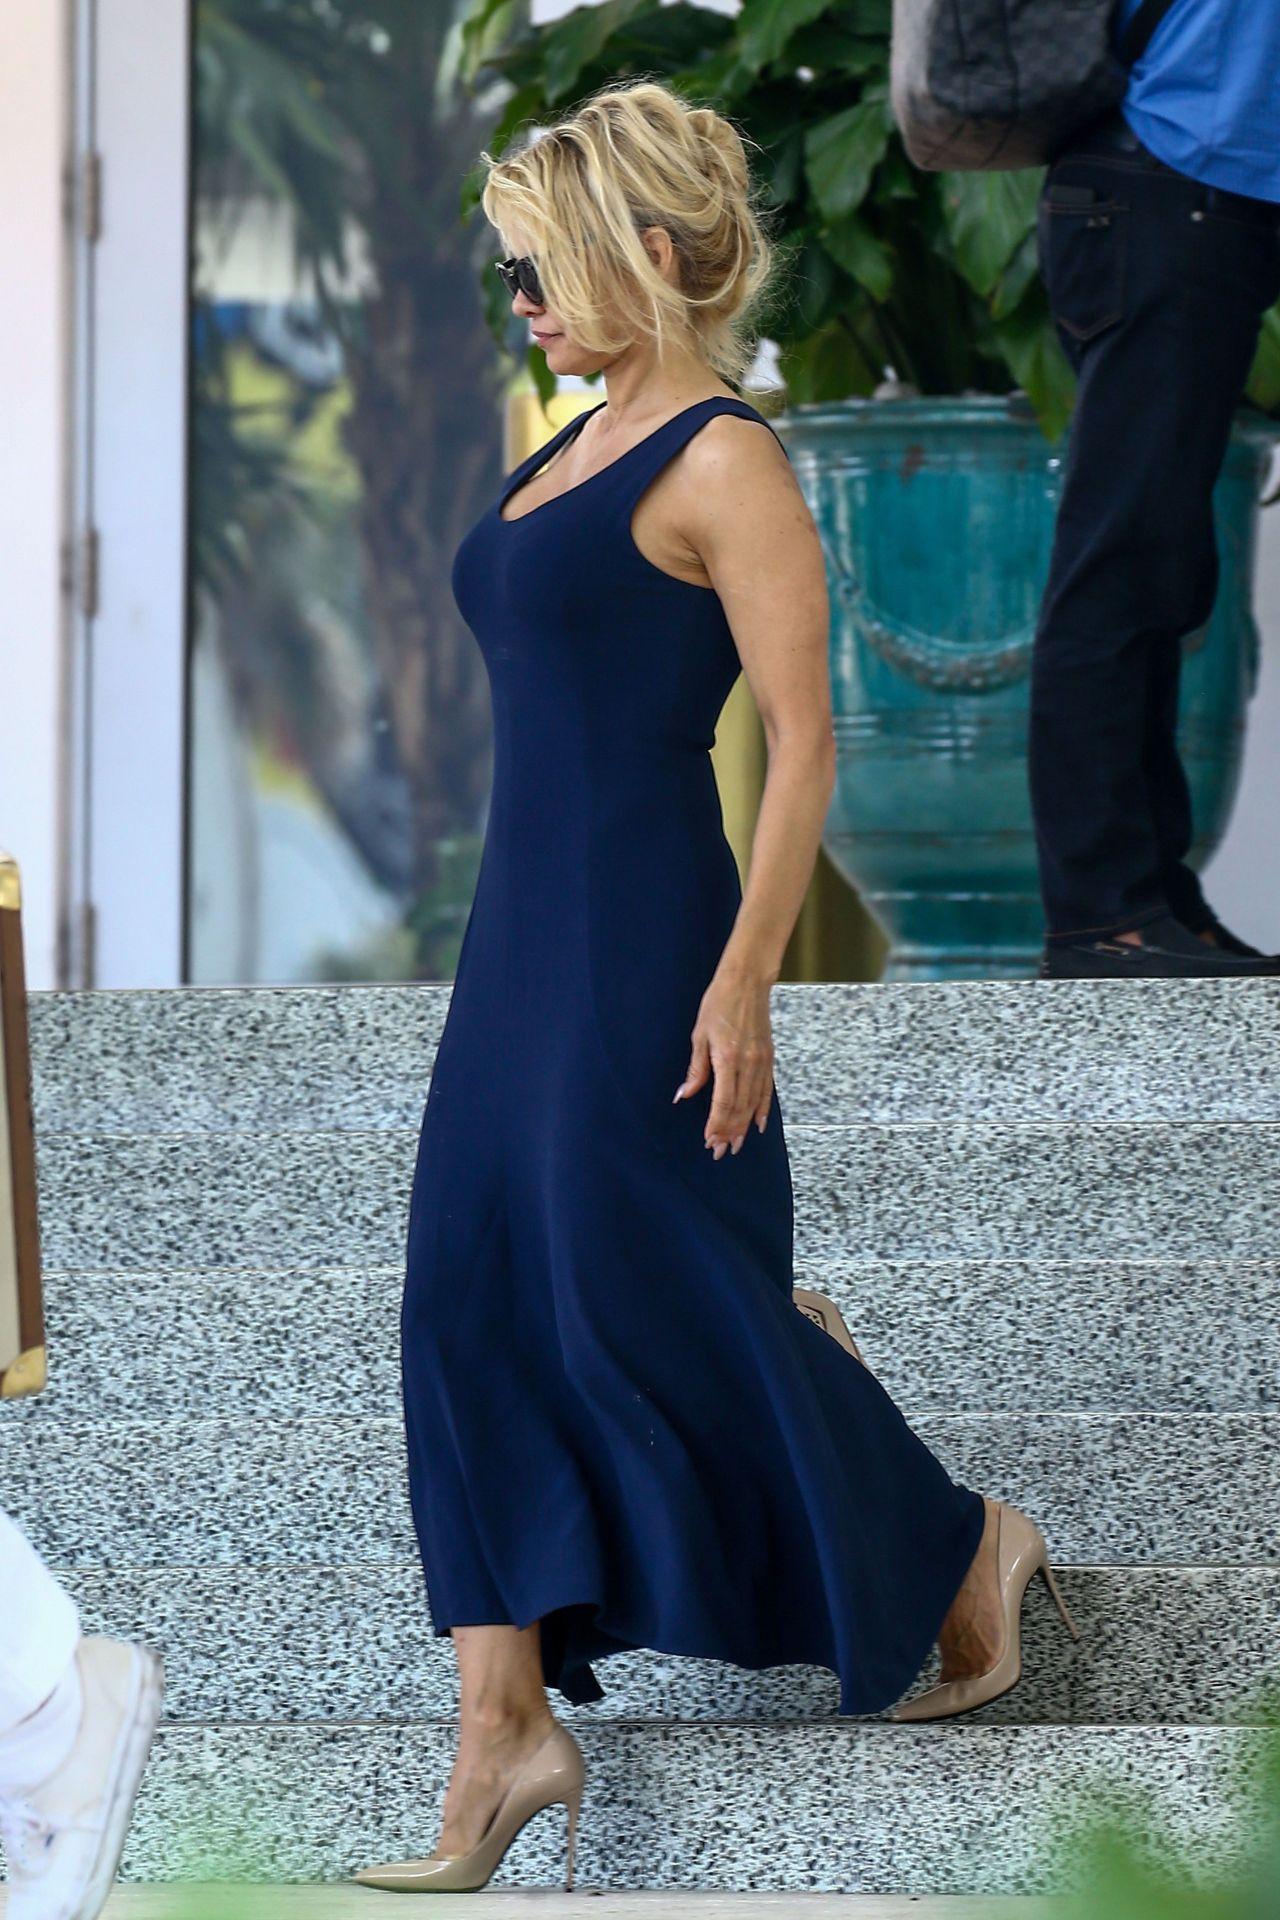 Pamela Anderson Fashion Style Miami 05 14 2017